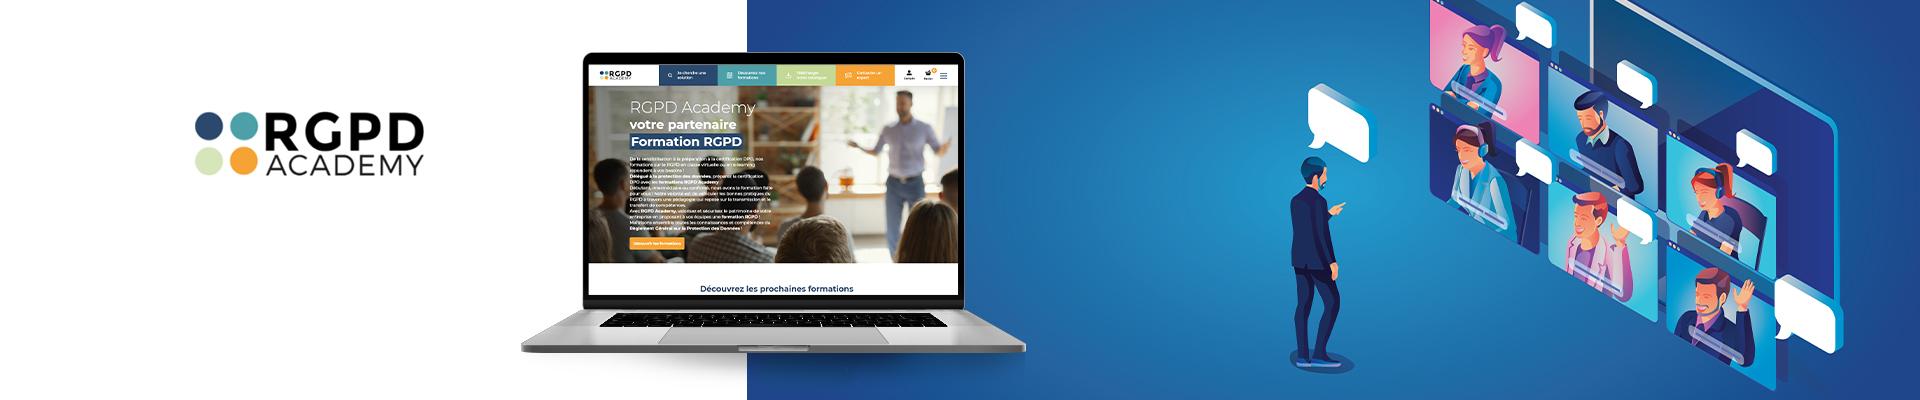 conception site web RGPD academy